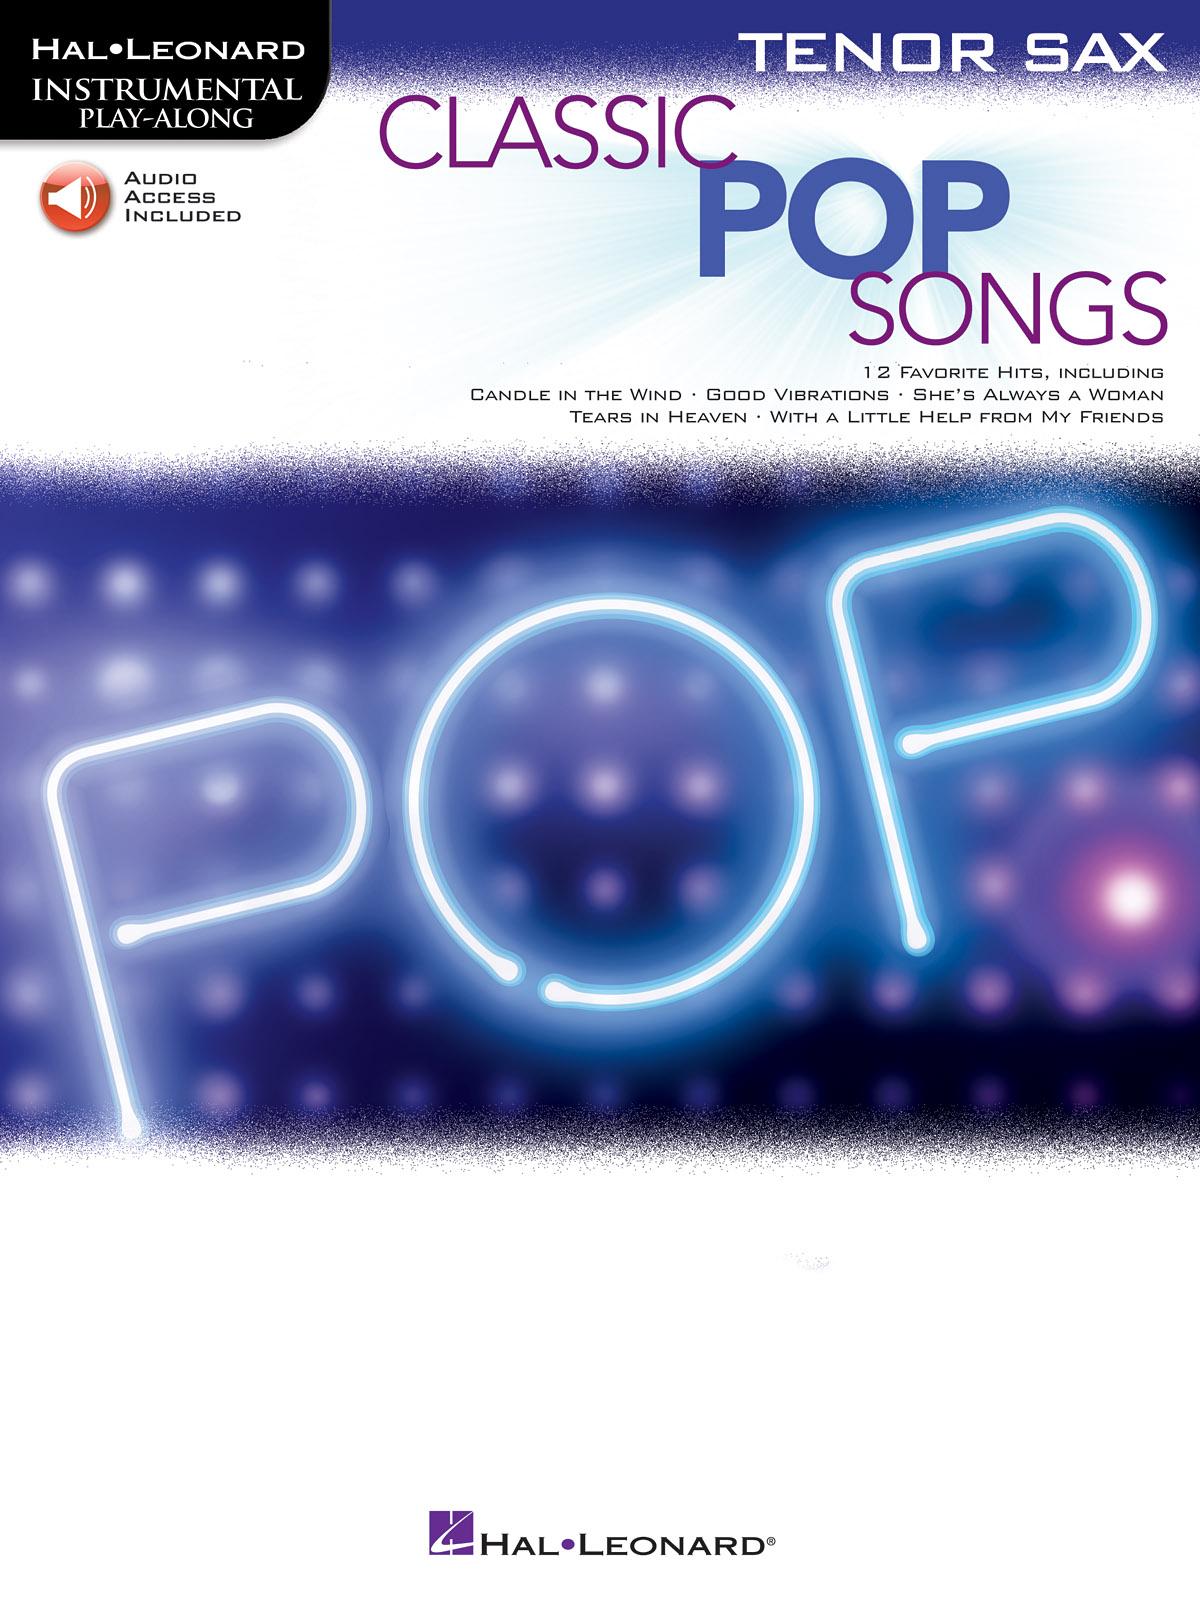 Classic Pop Songs: Tenor Saxophone: Instrumental Album